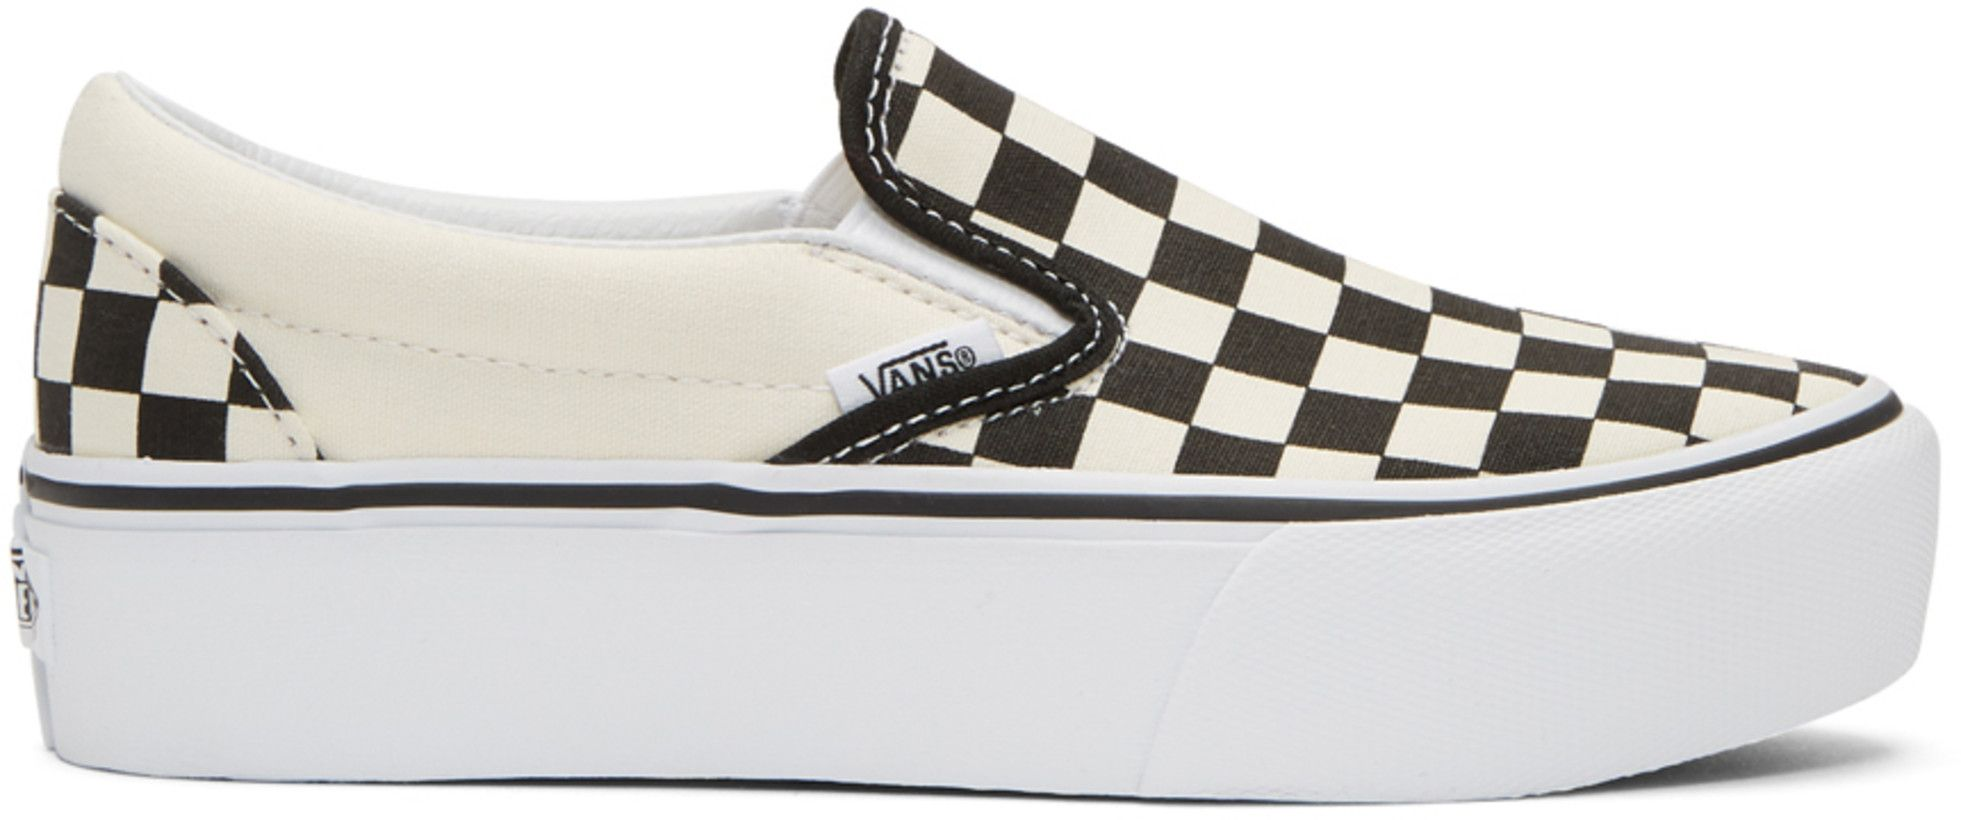 f6a2c3df4e Vans - Off-White   Black Checkerboard Classic Slip-On Platform Sneakers